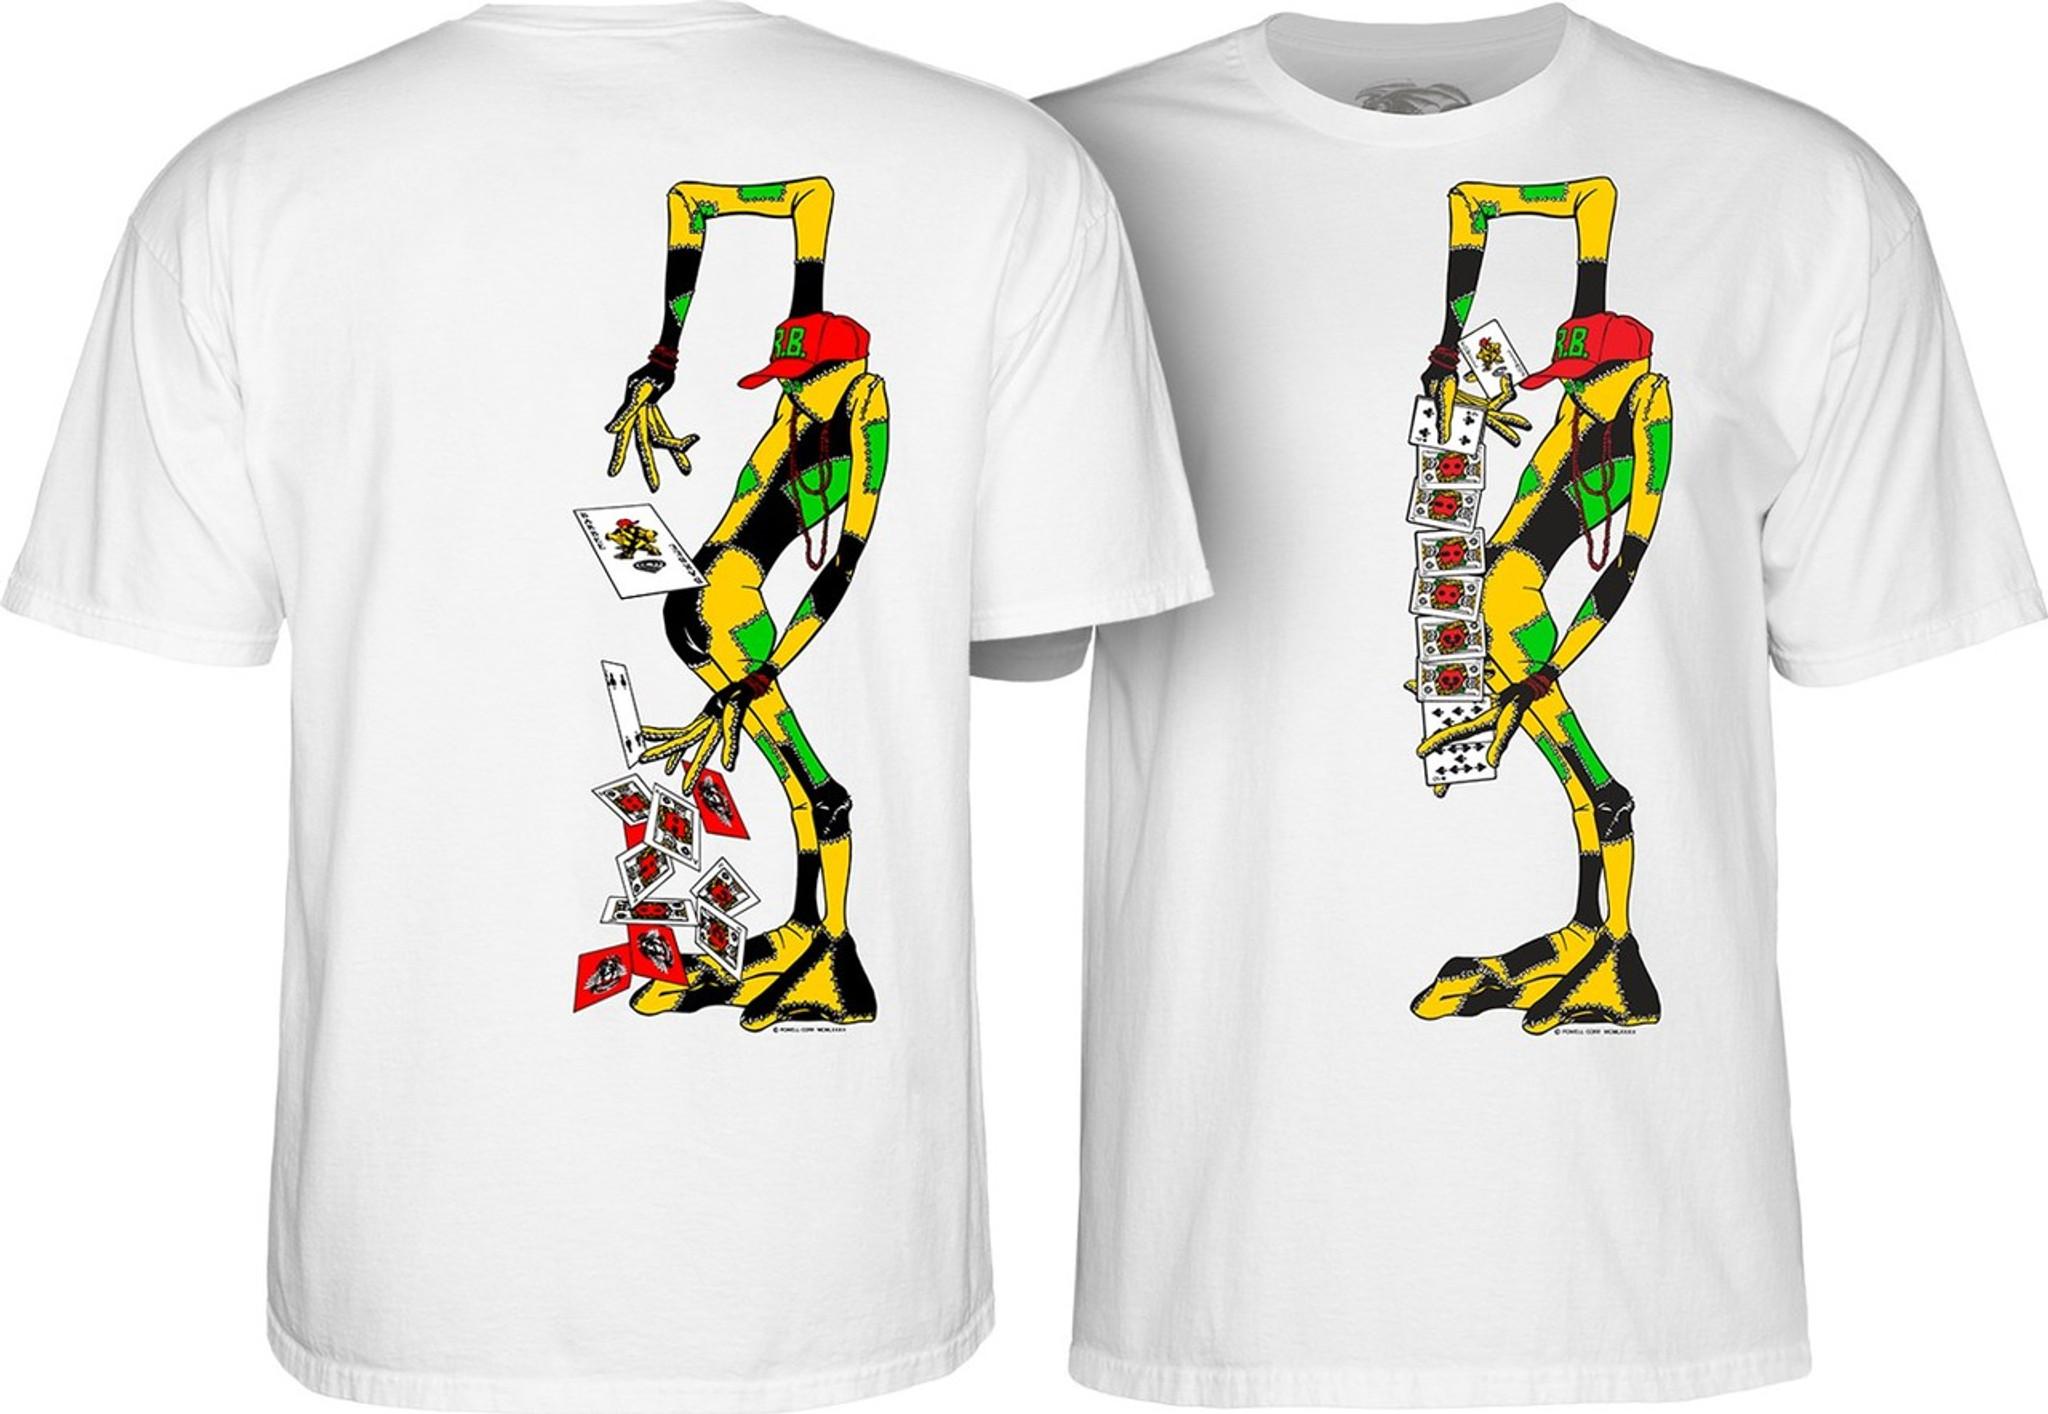 Powell Peralta Ray Barbee RAG DOLL Skateboard T Shirt RED XL